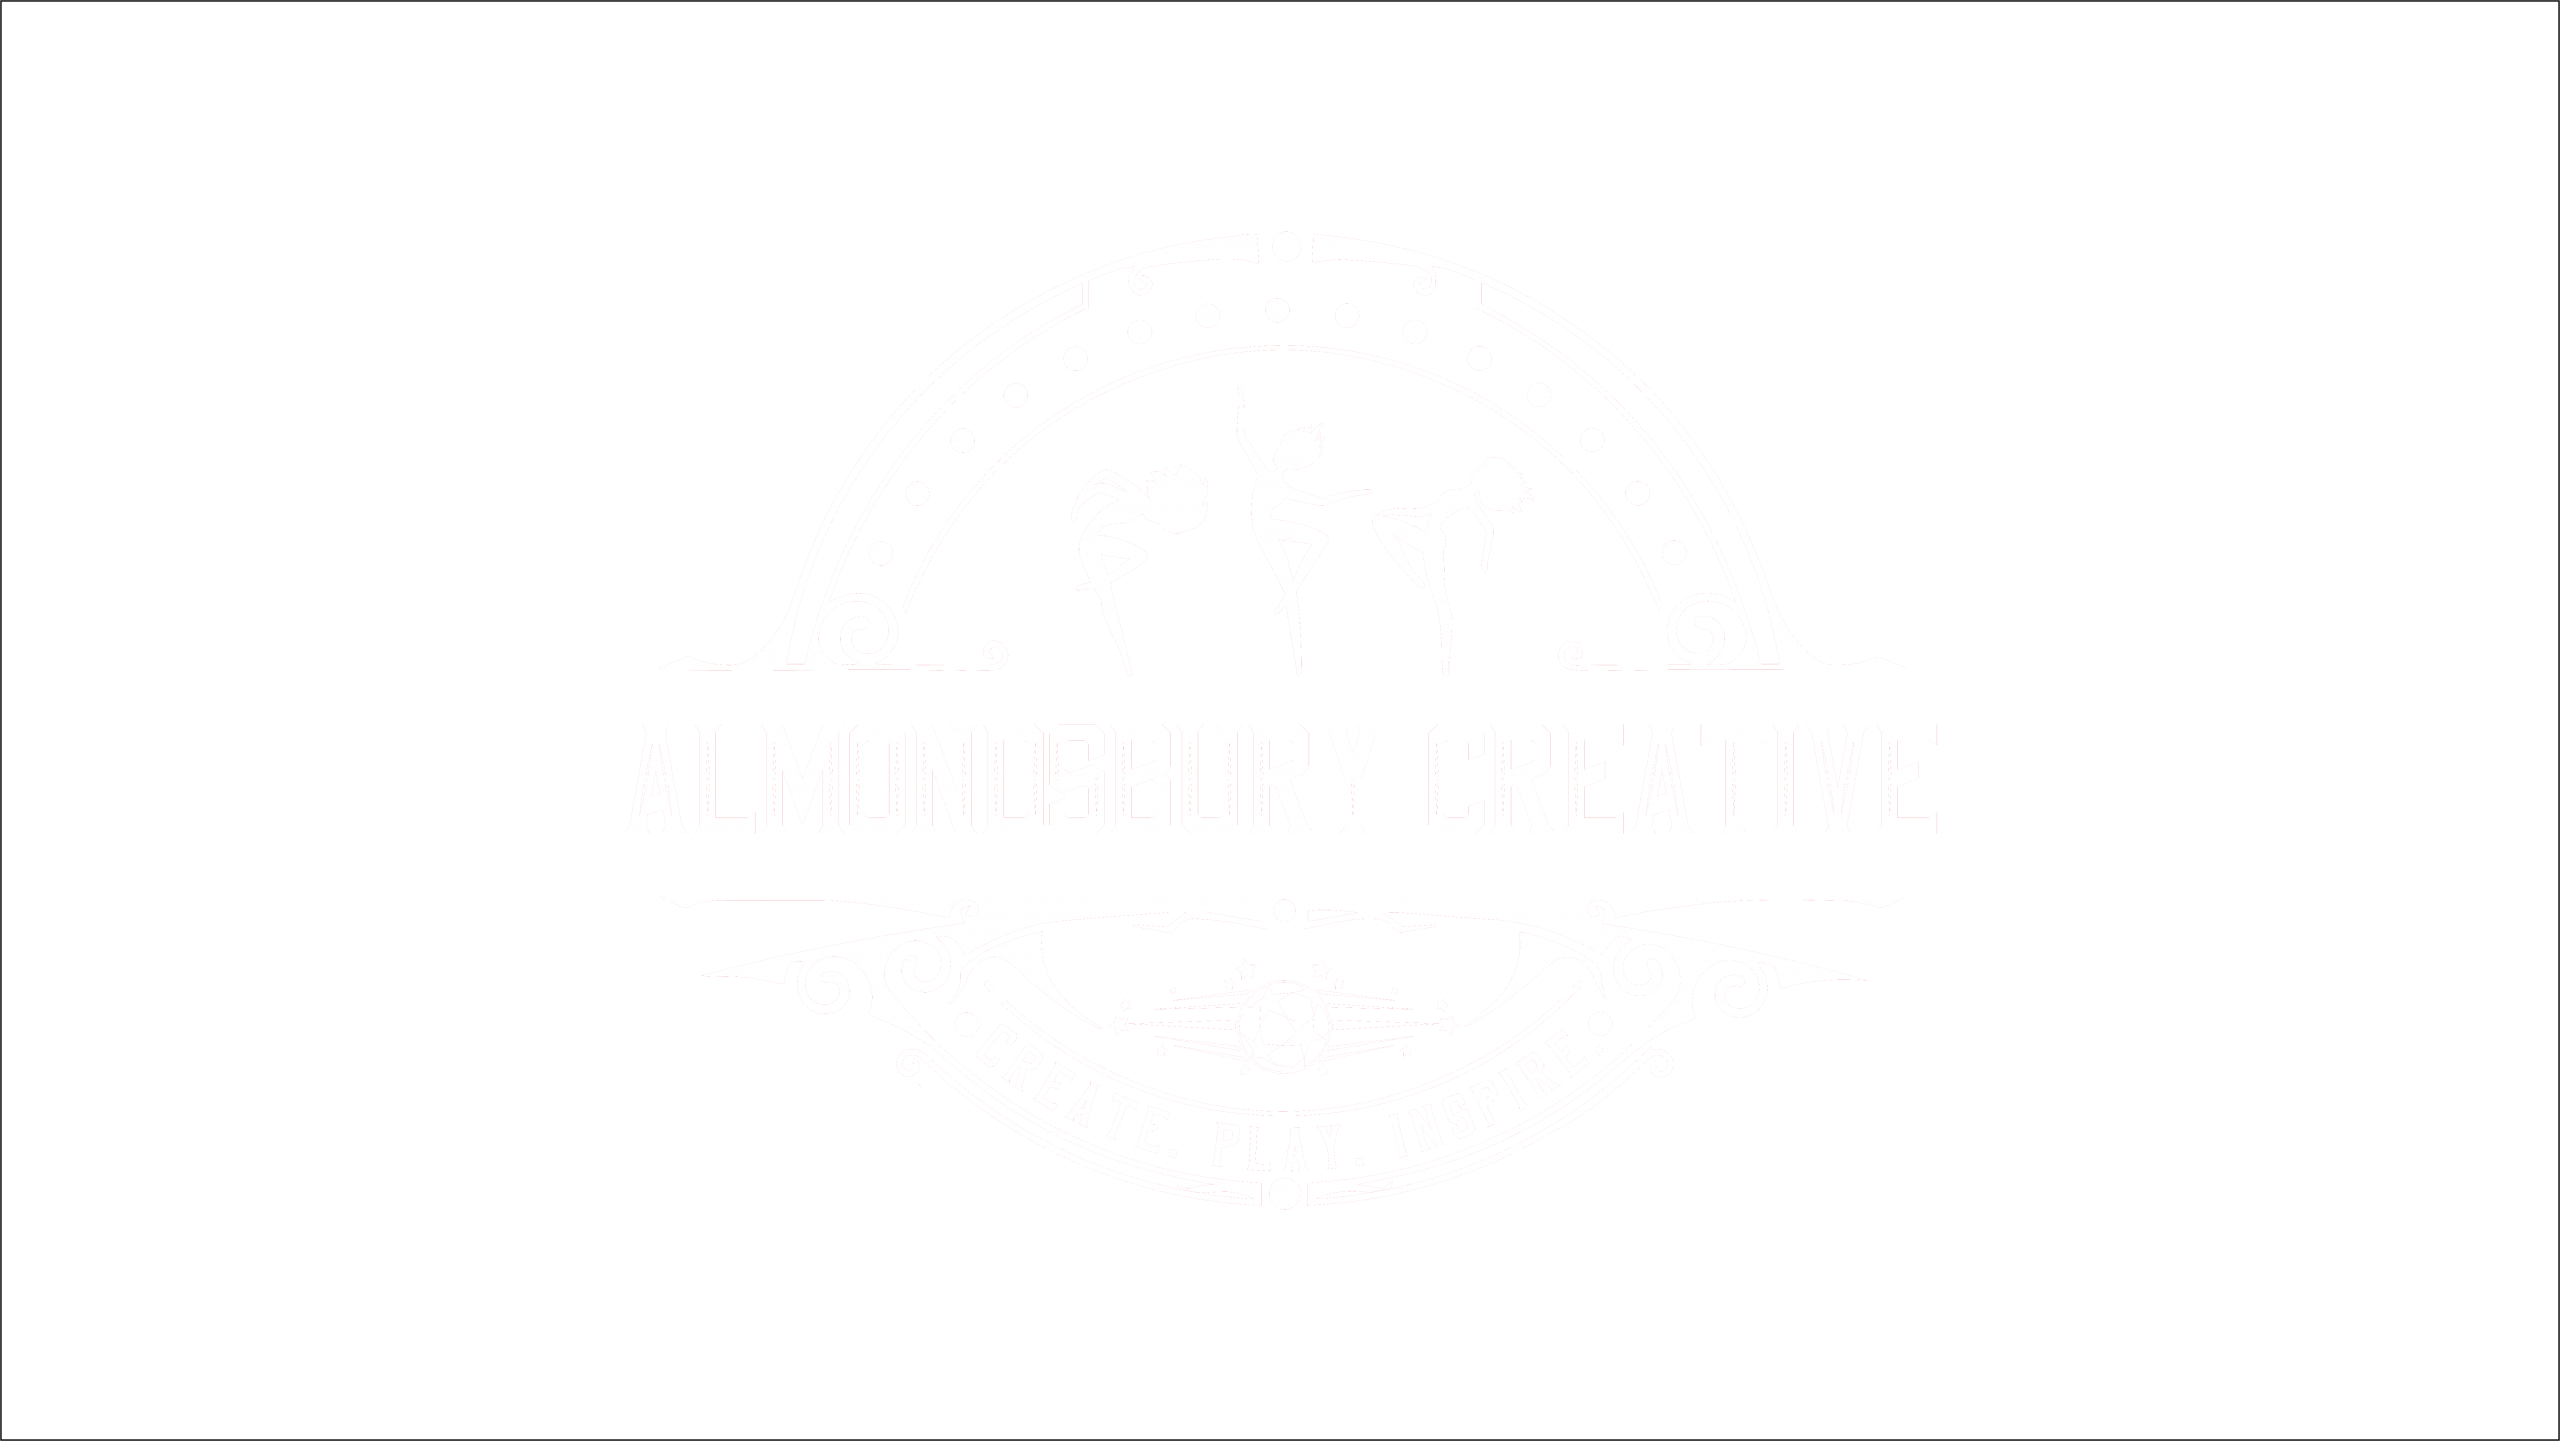 Almondsbury Creative